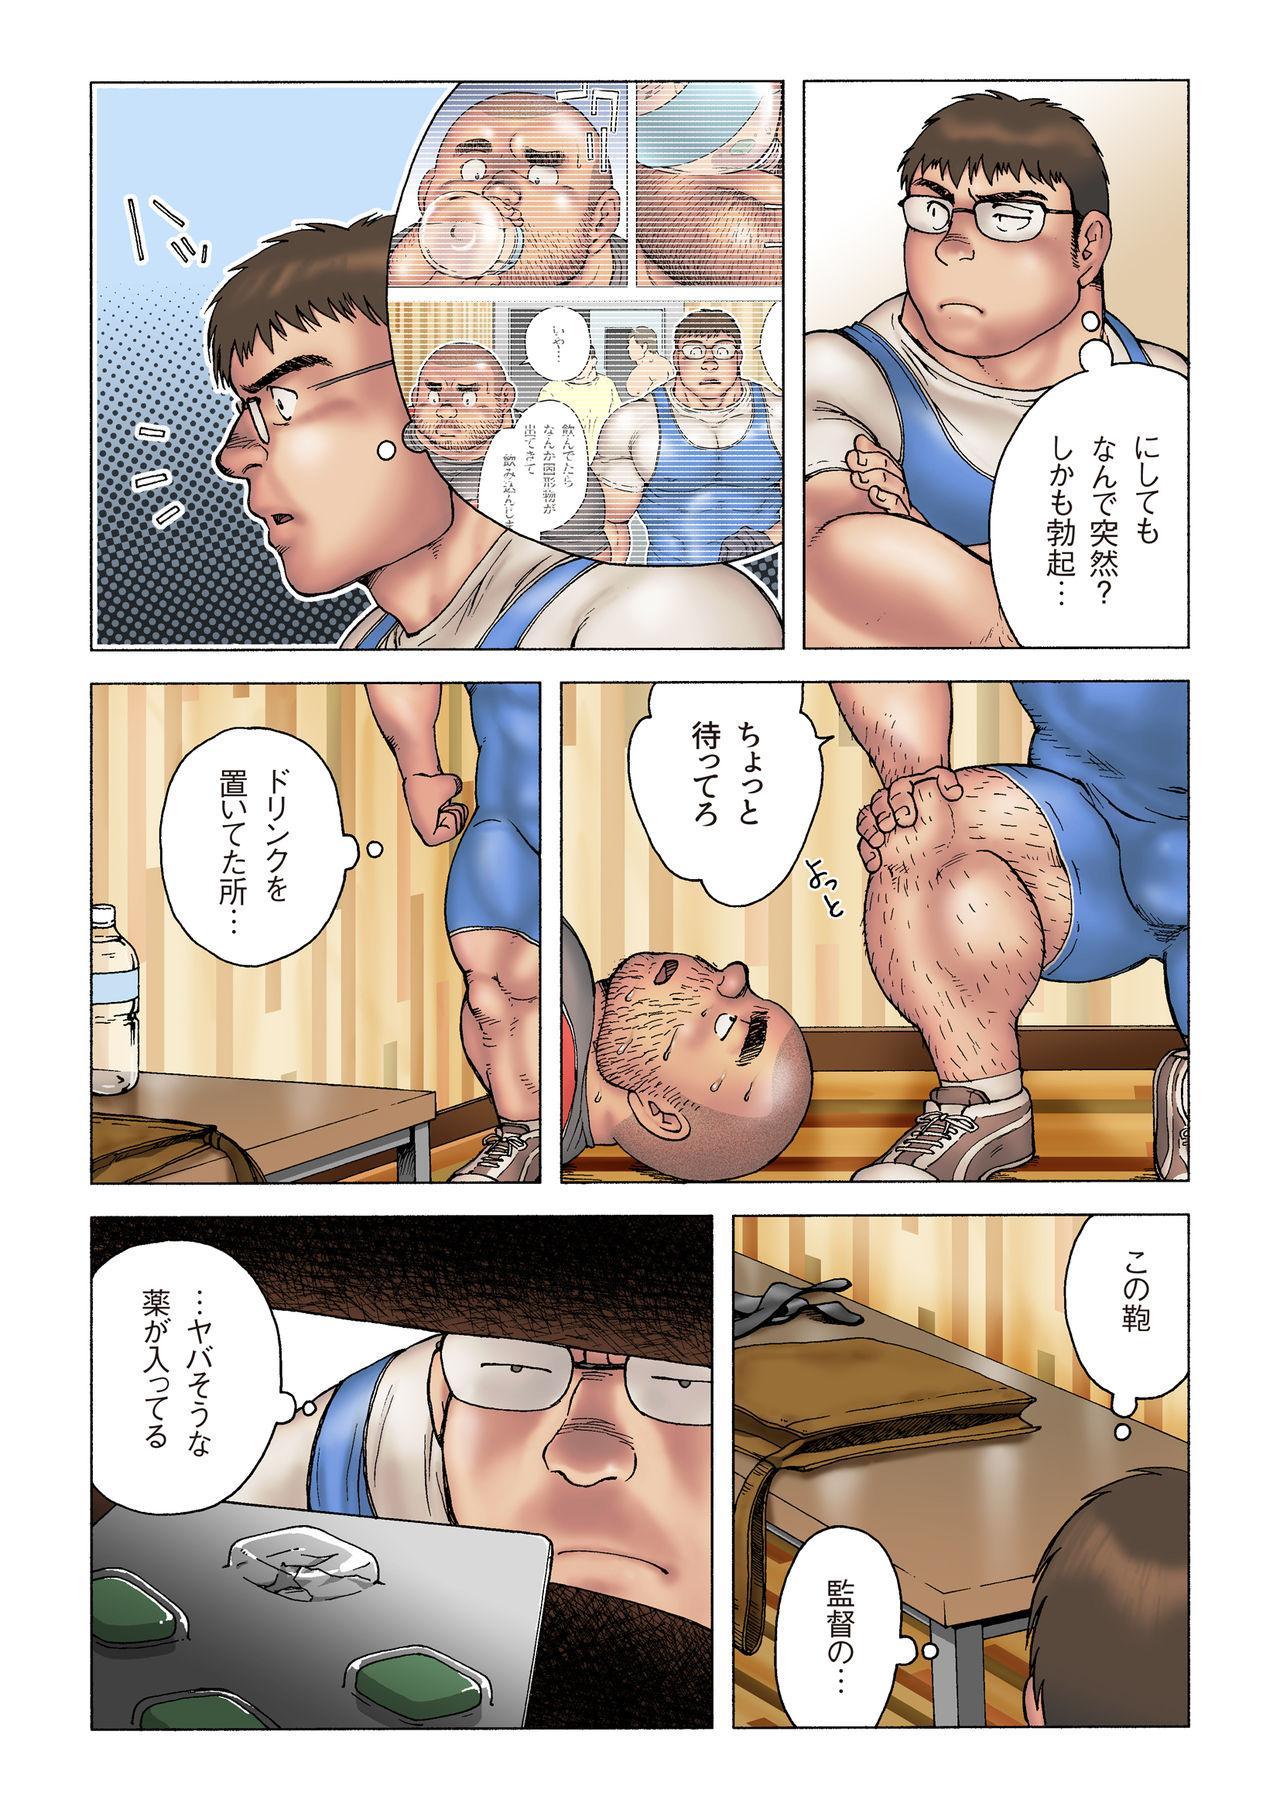 Danshi Koukousei Weightlifter Shiai-chuu, Osae kirenai Wakai Takeri 12